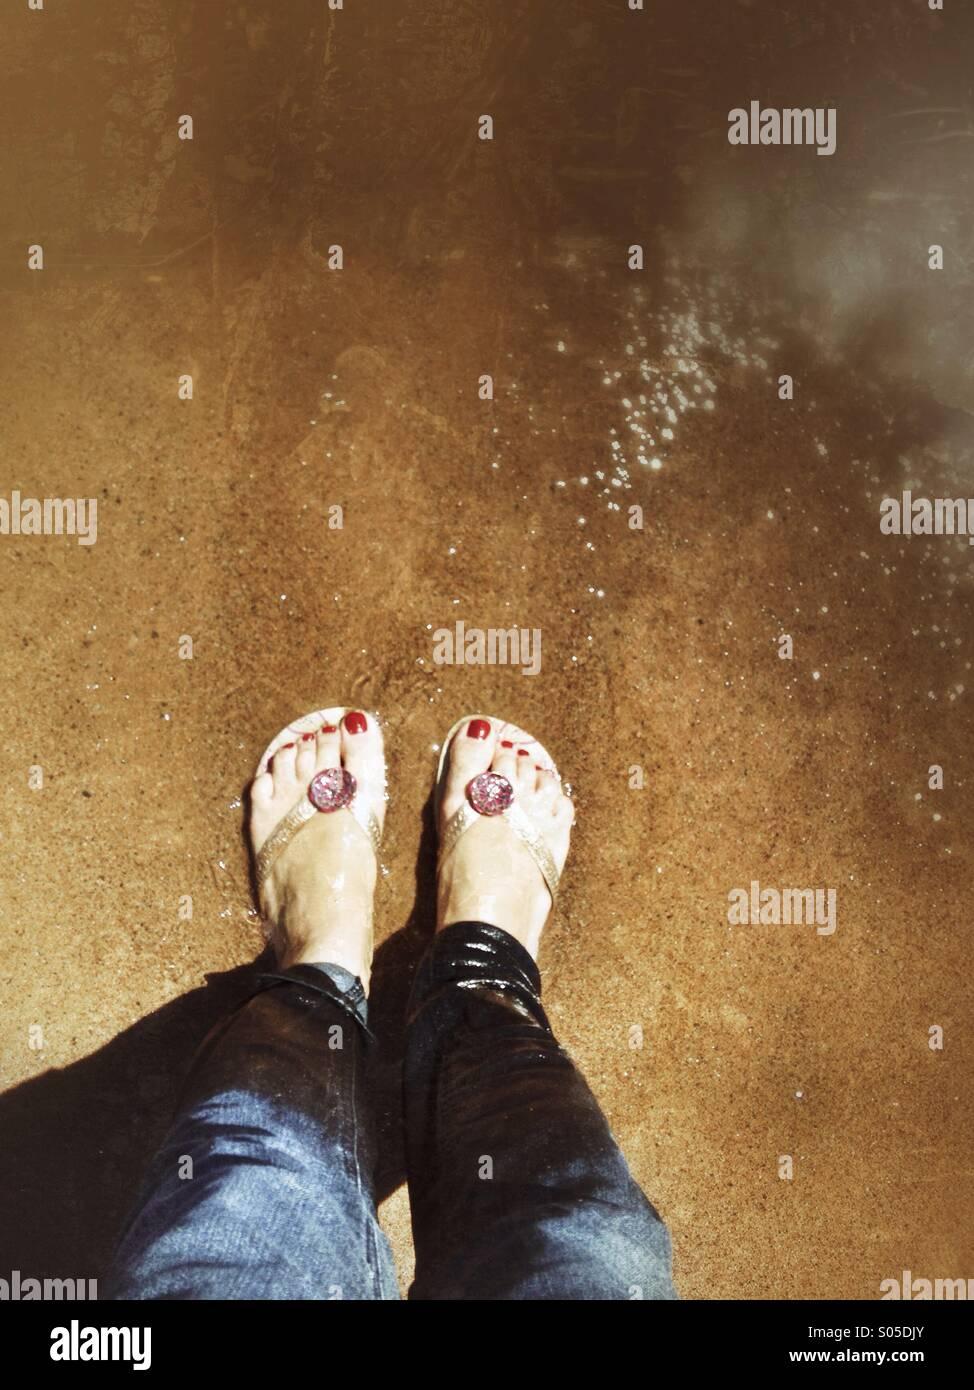 Feet on beach - Stock Image